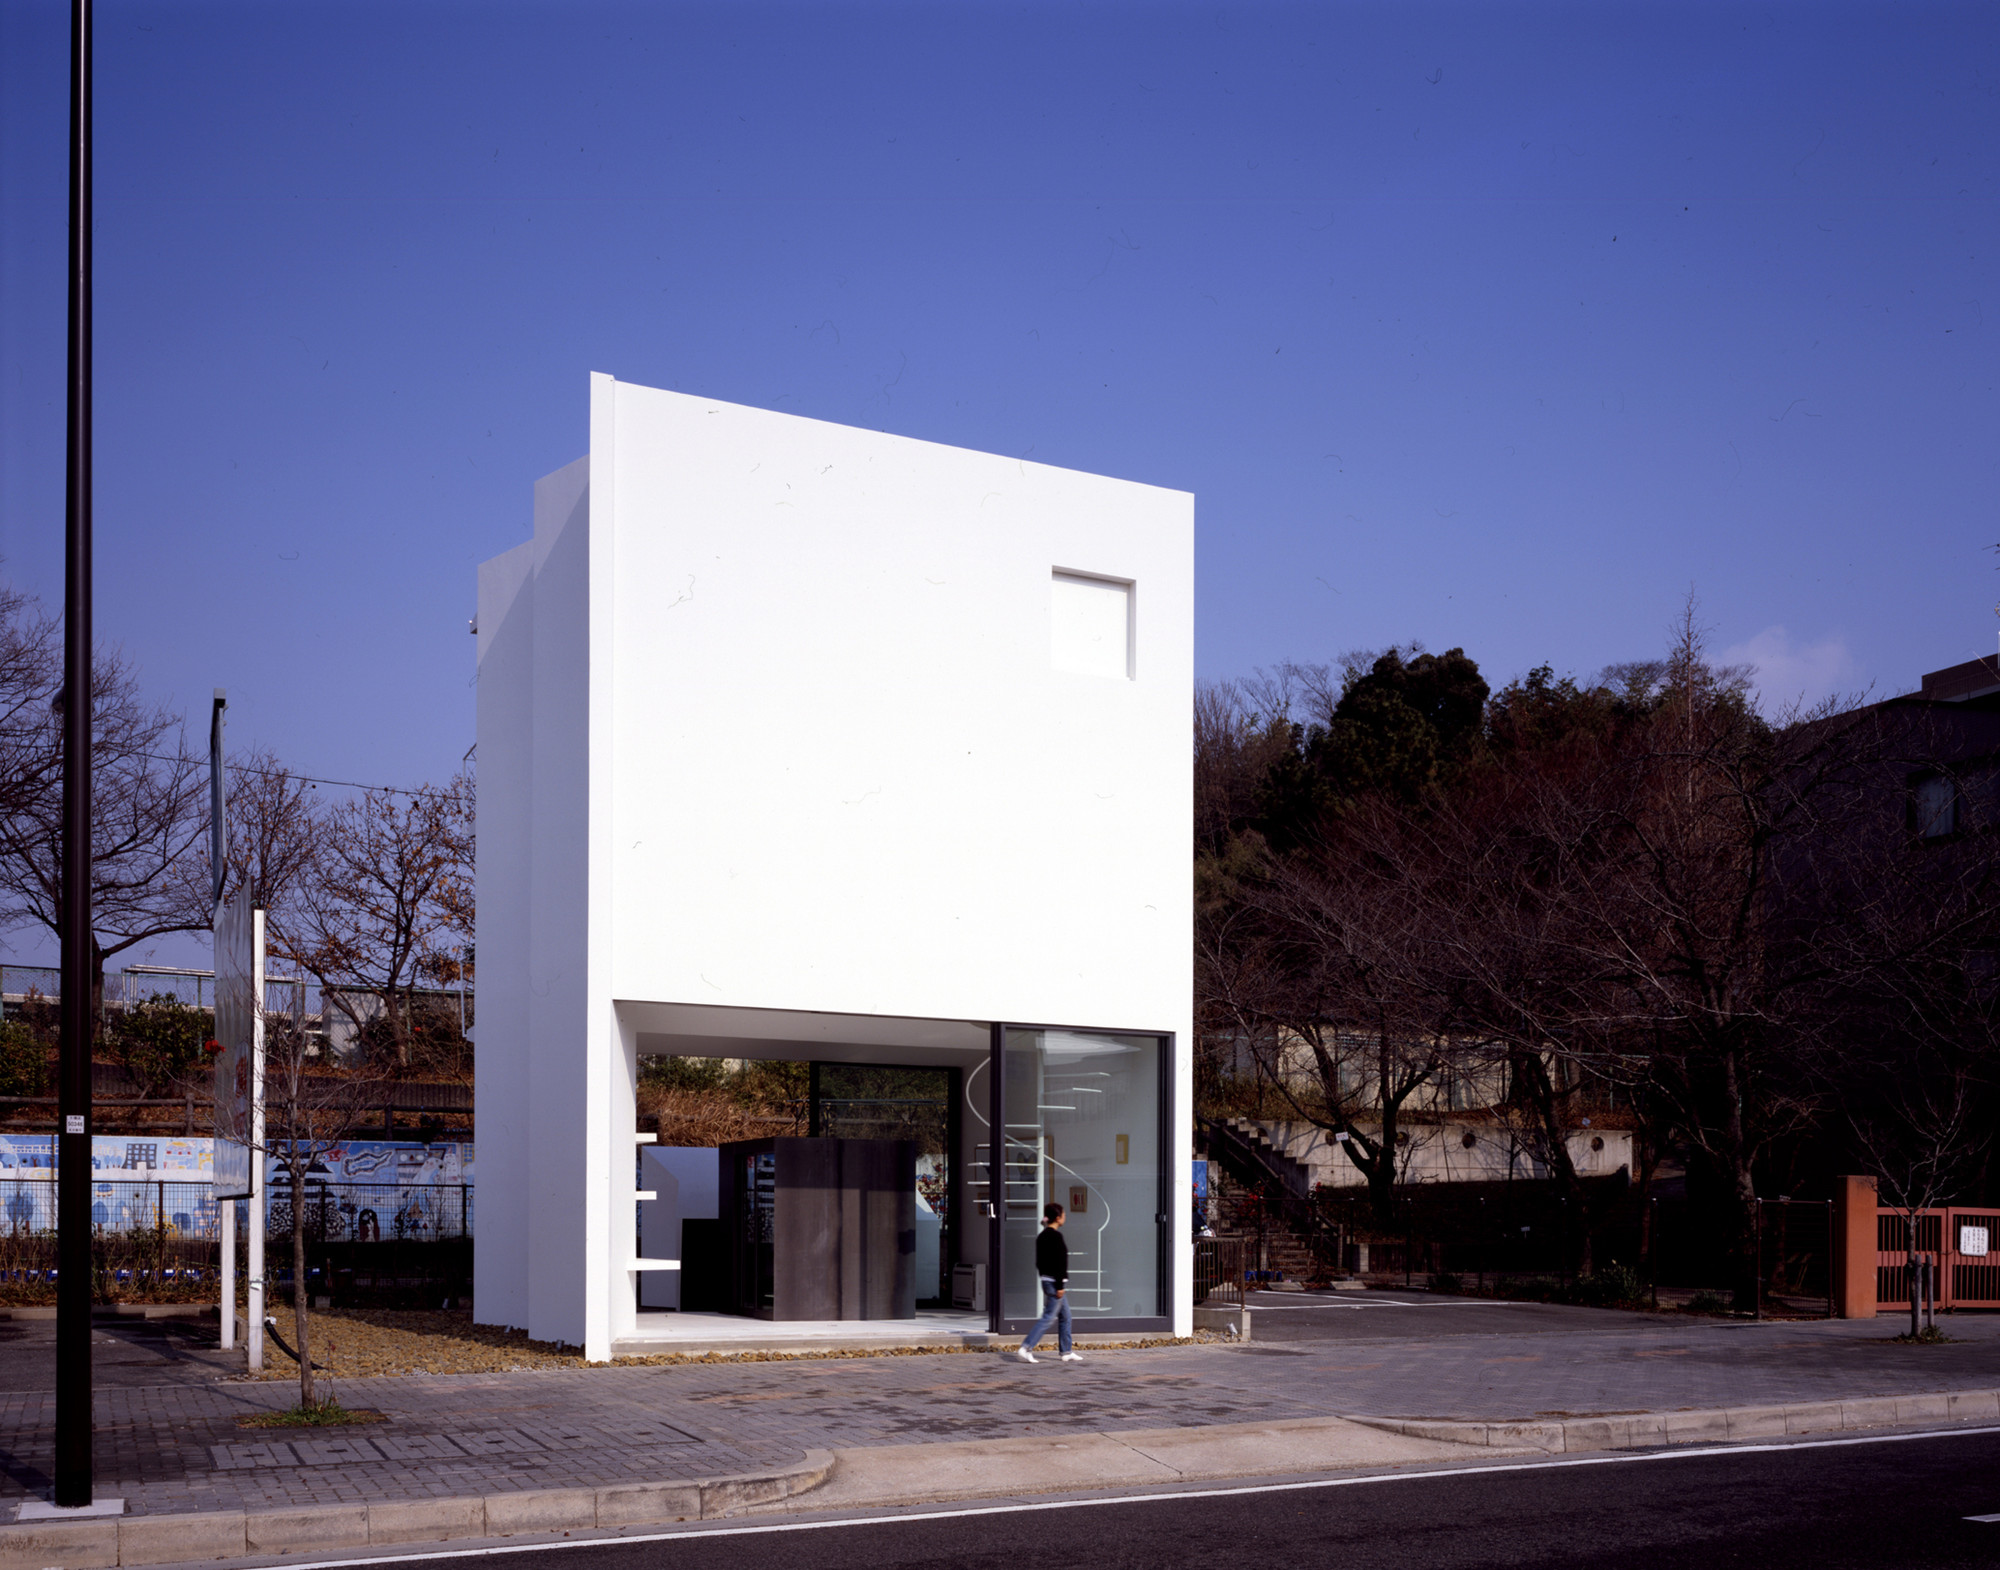 House in Nagoya 01 / Suppose Design Office